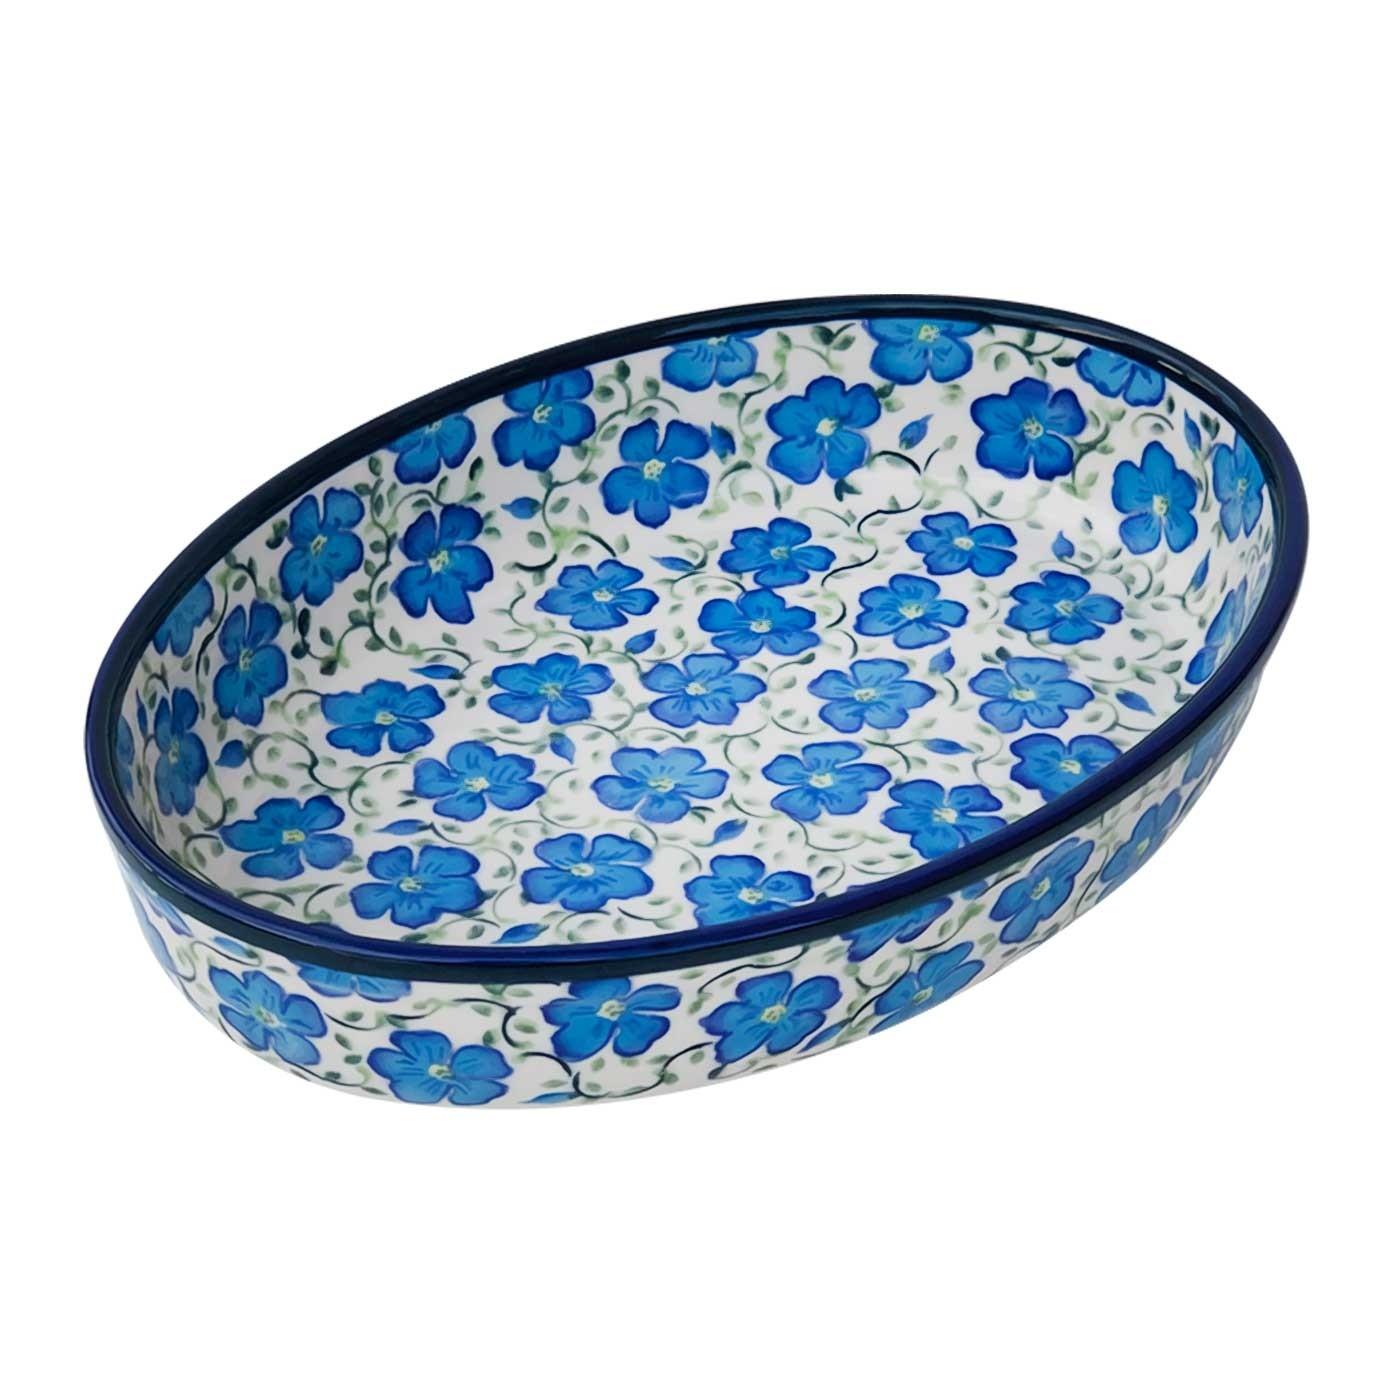 Pottery Avenue BLUE HARMON 11-inch Stoneware Oval Dish/Baker - 349-352AR